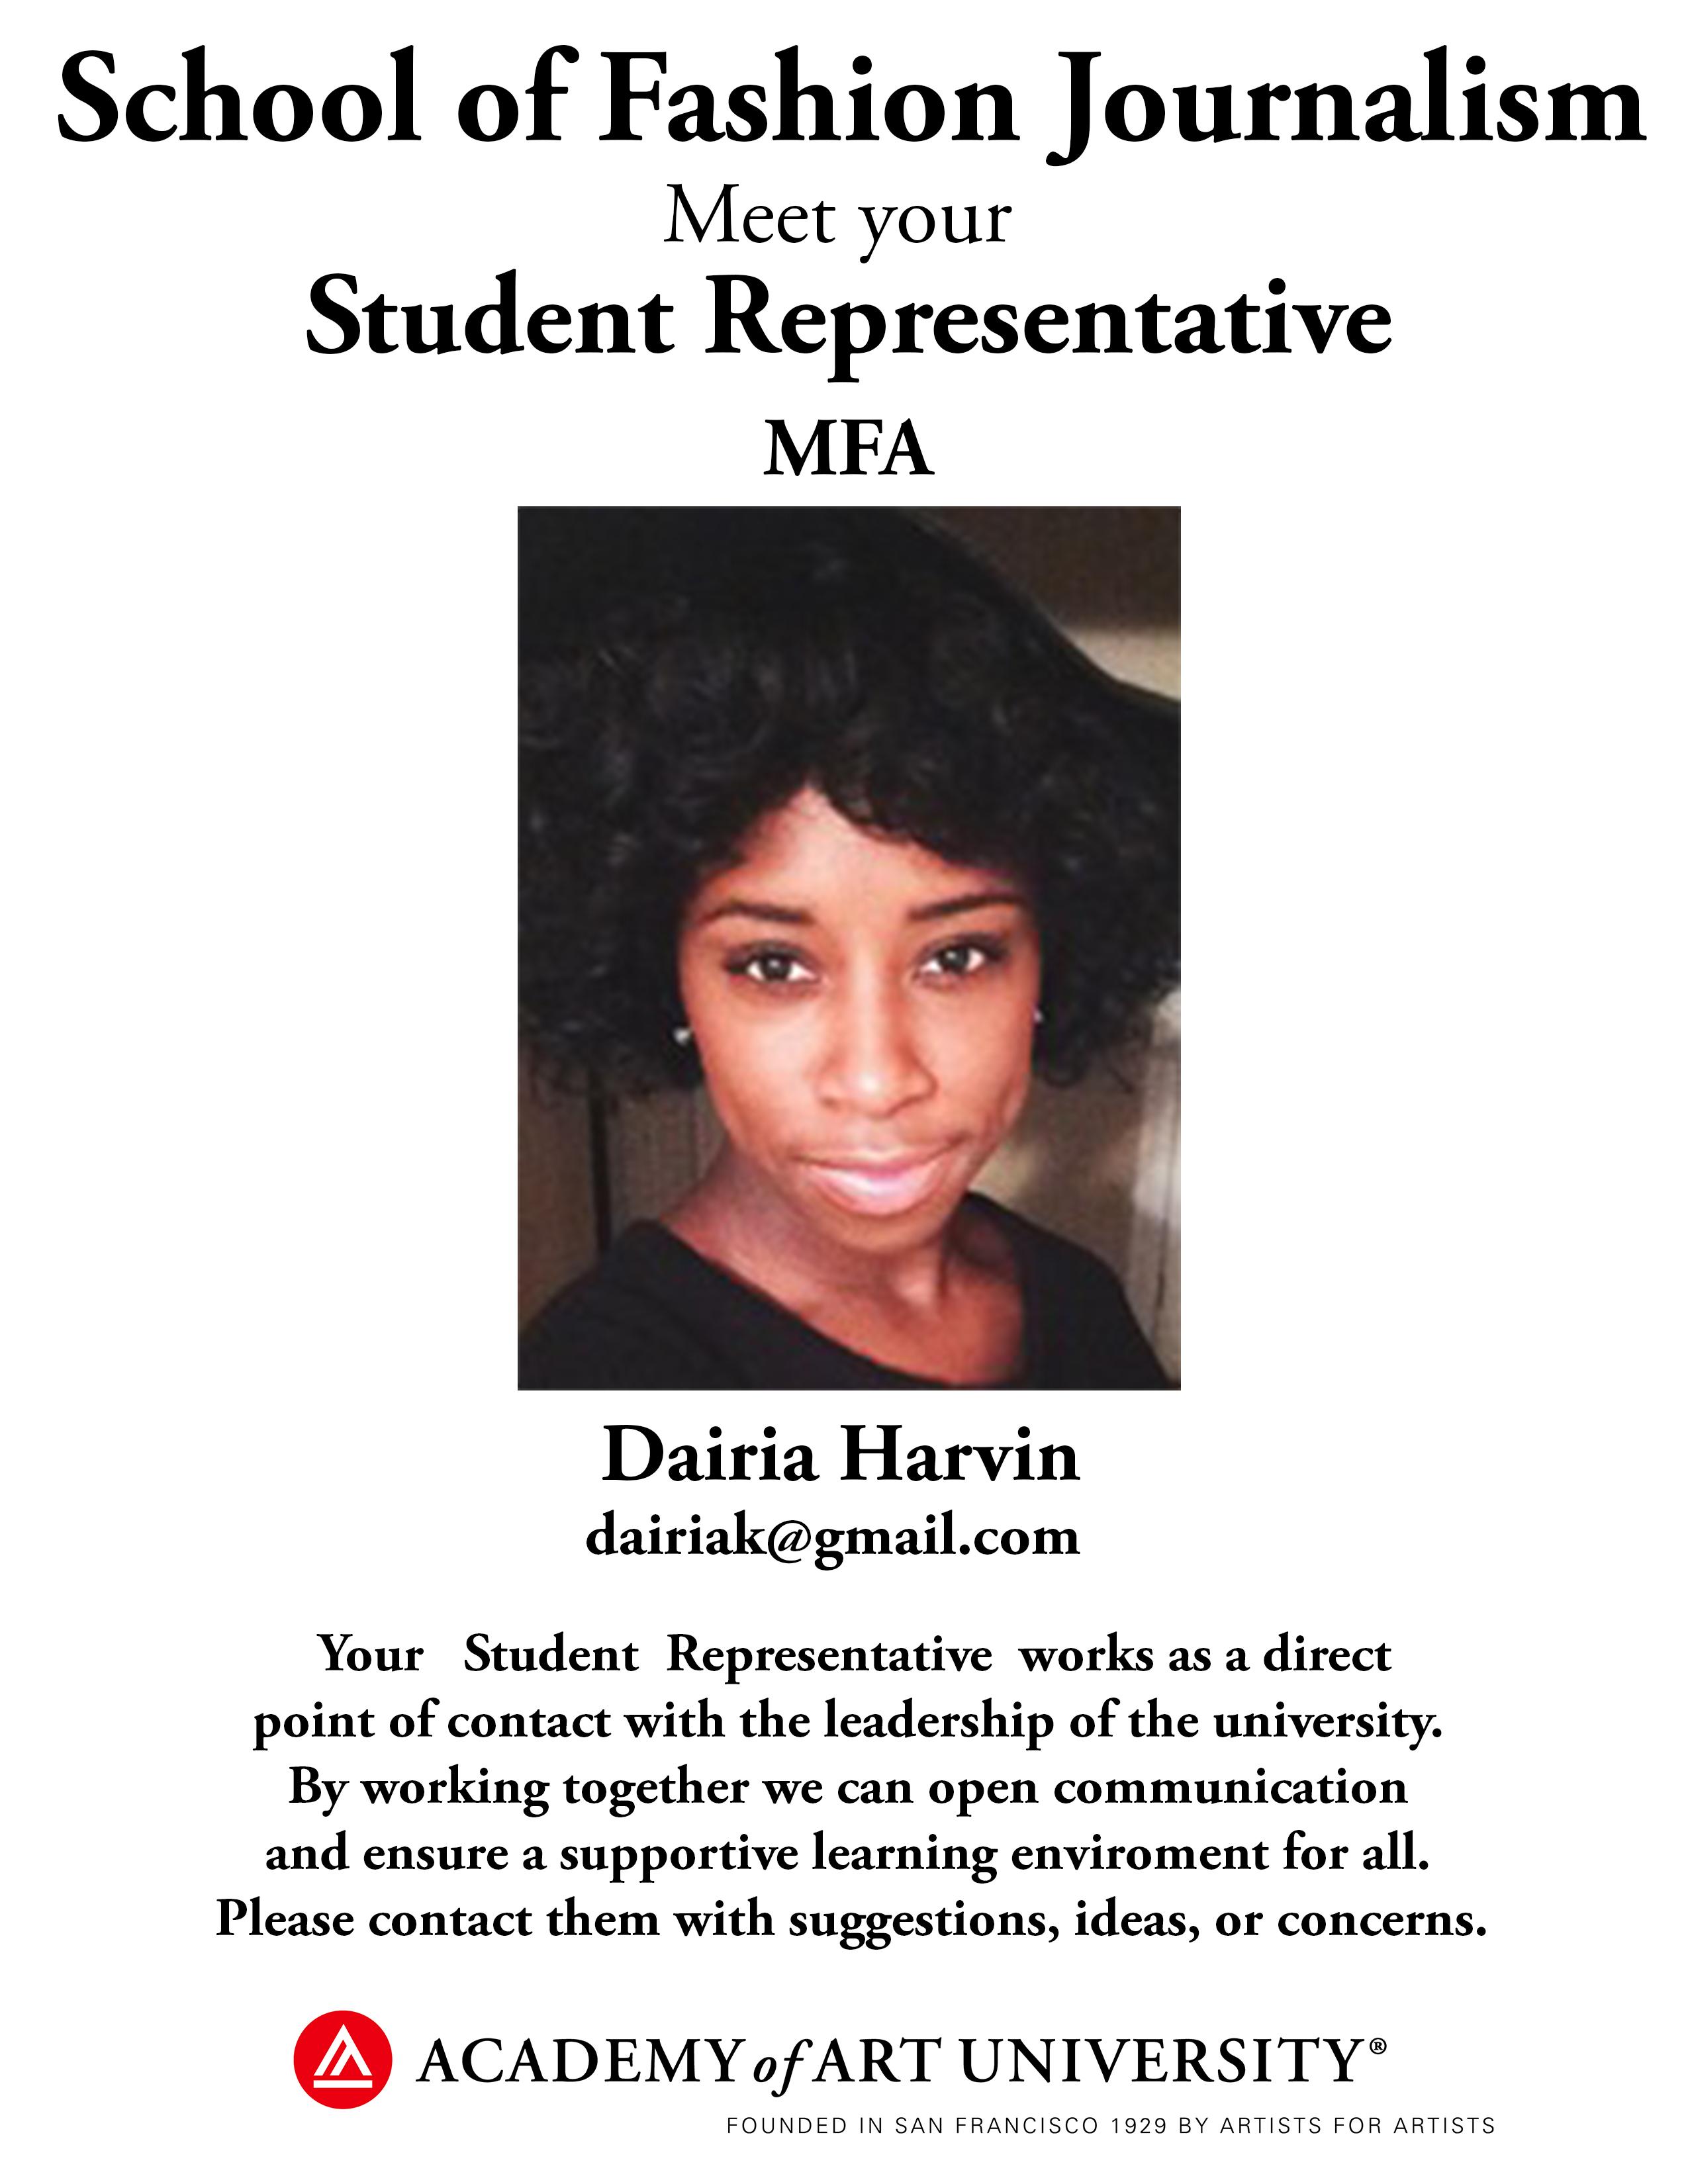 MFA Fashion Journalism student representative Dairia Harvin/email: dairiak@gmail.com